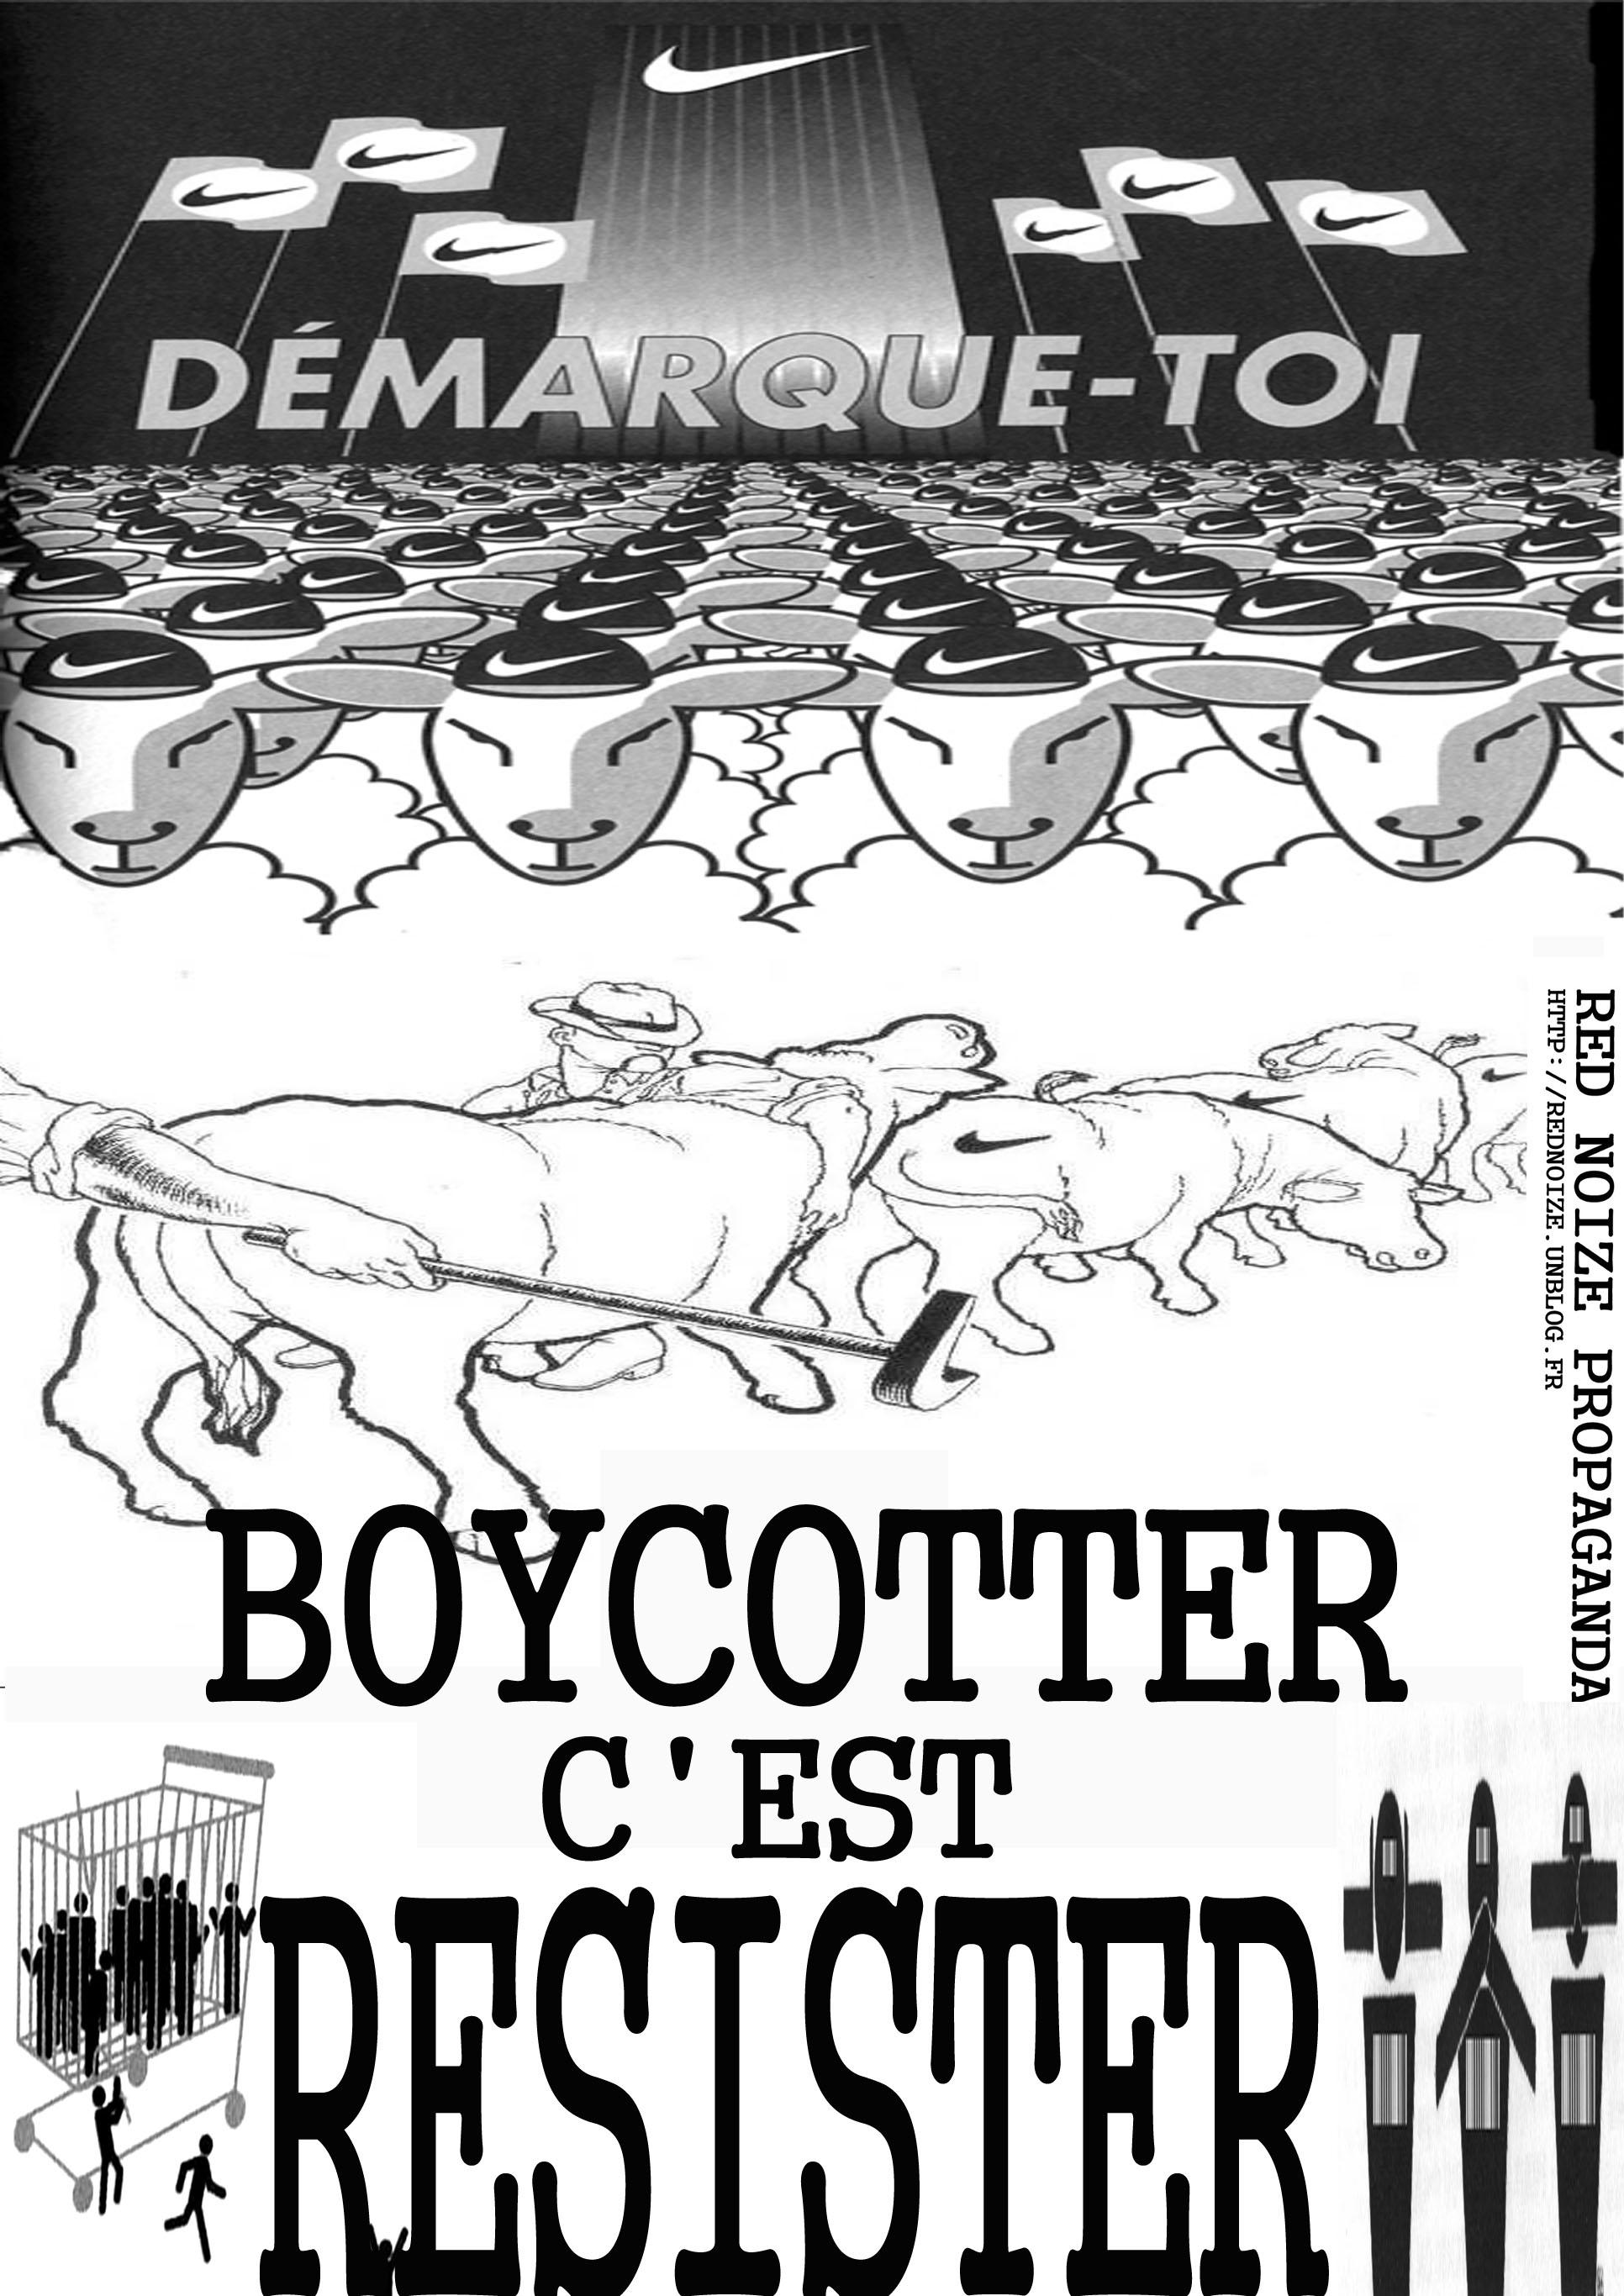 http://rednoize.e.r.f.unblog.fr/files/2007/05/boycottcopier.jpg